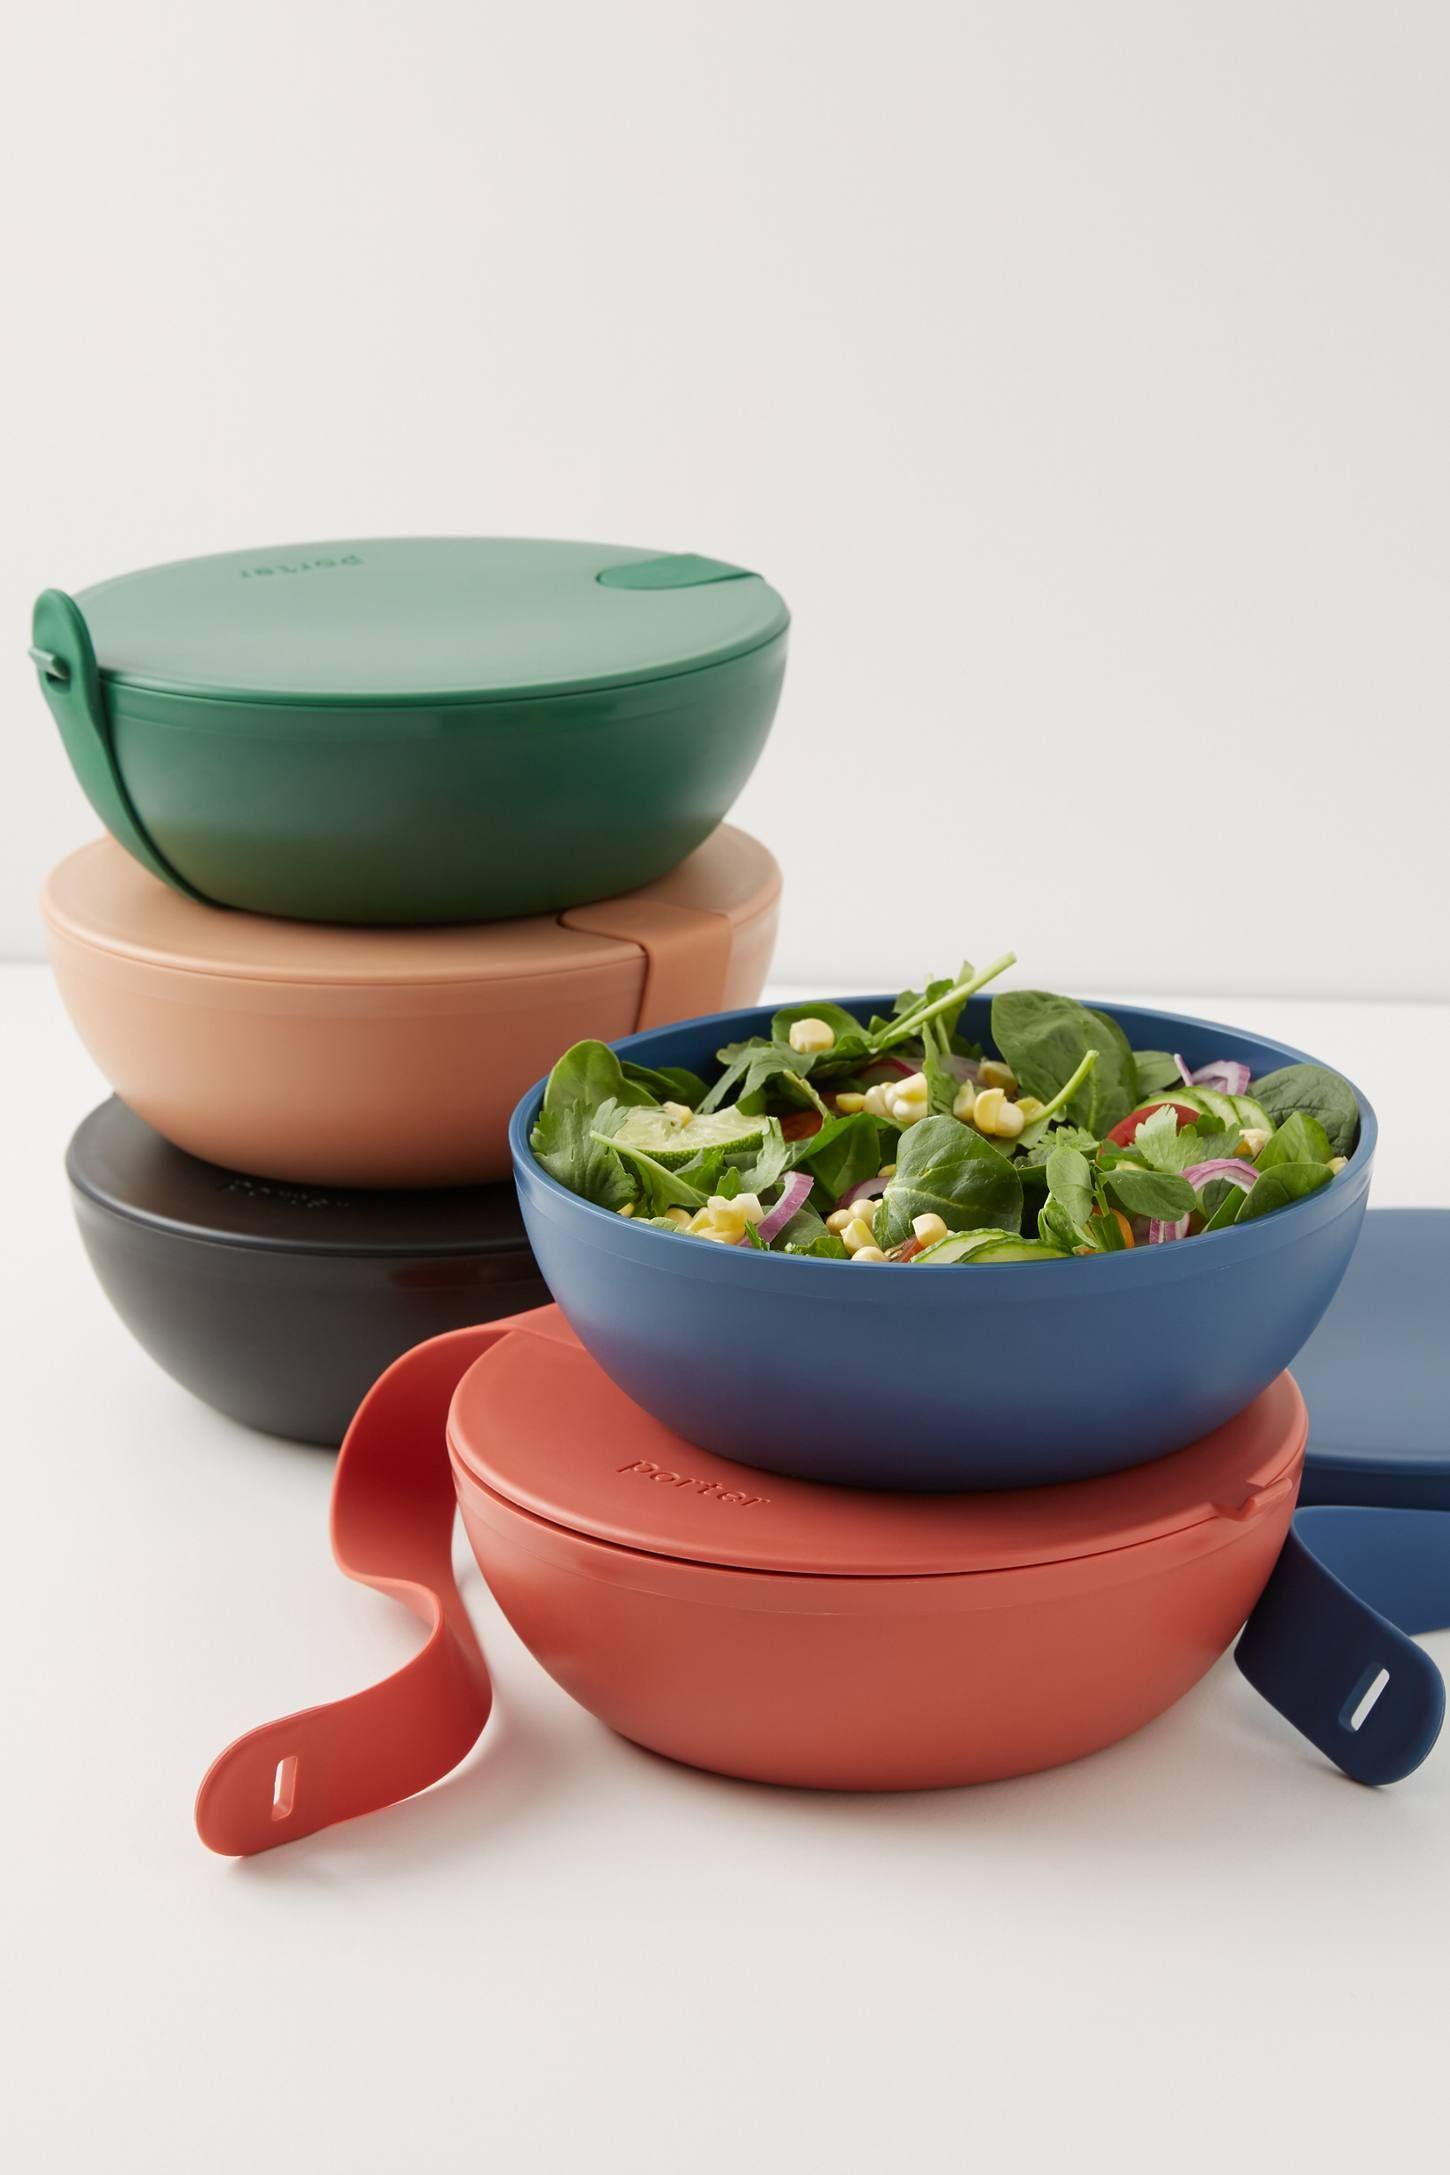 W&P Plastic Porter Storage Bowl Storage bowls, Bowl